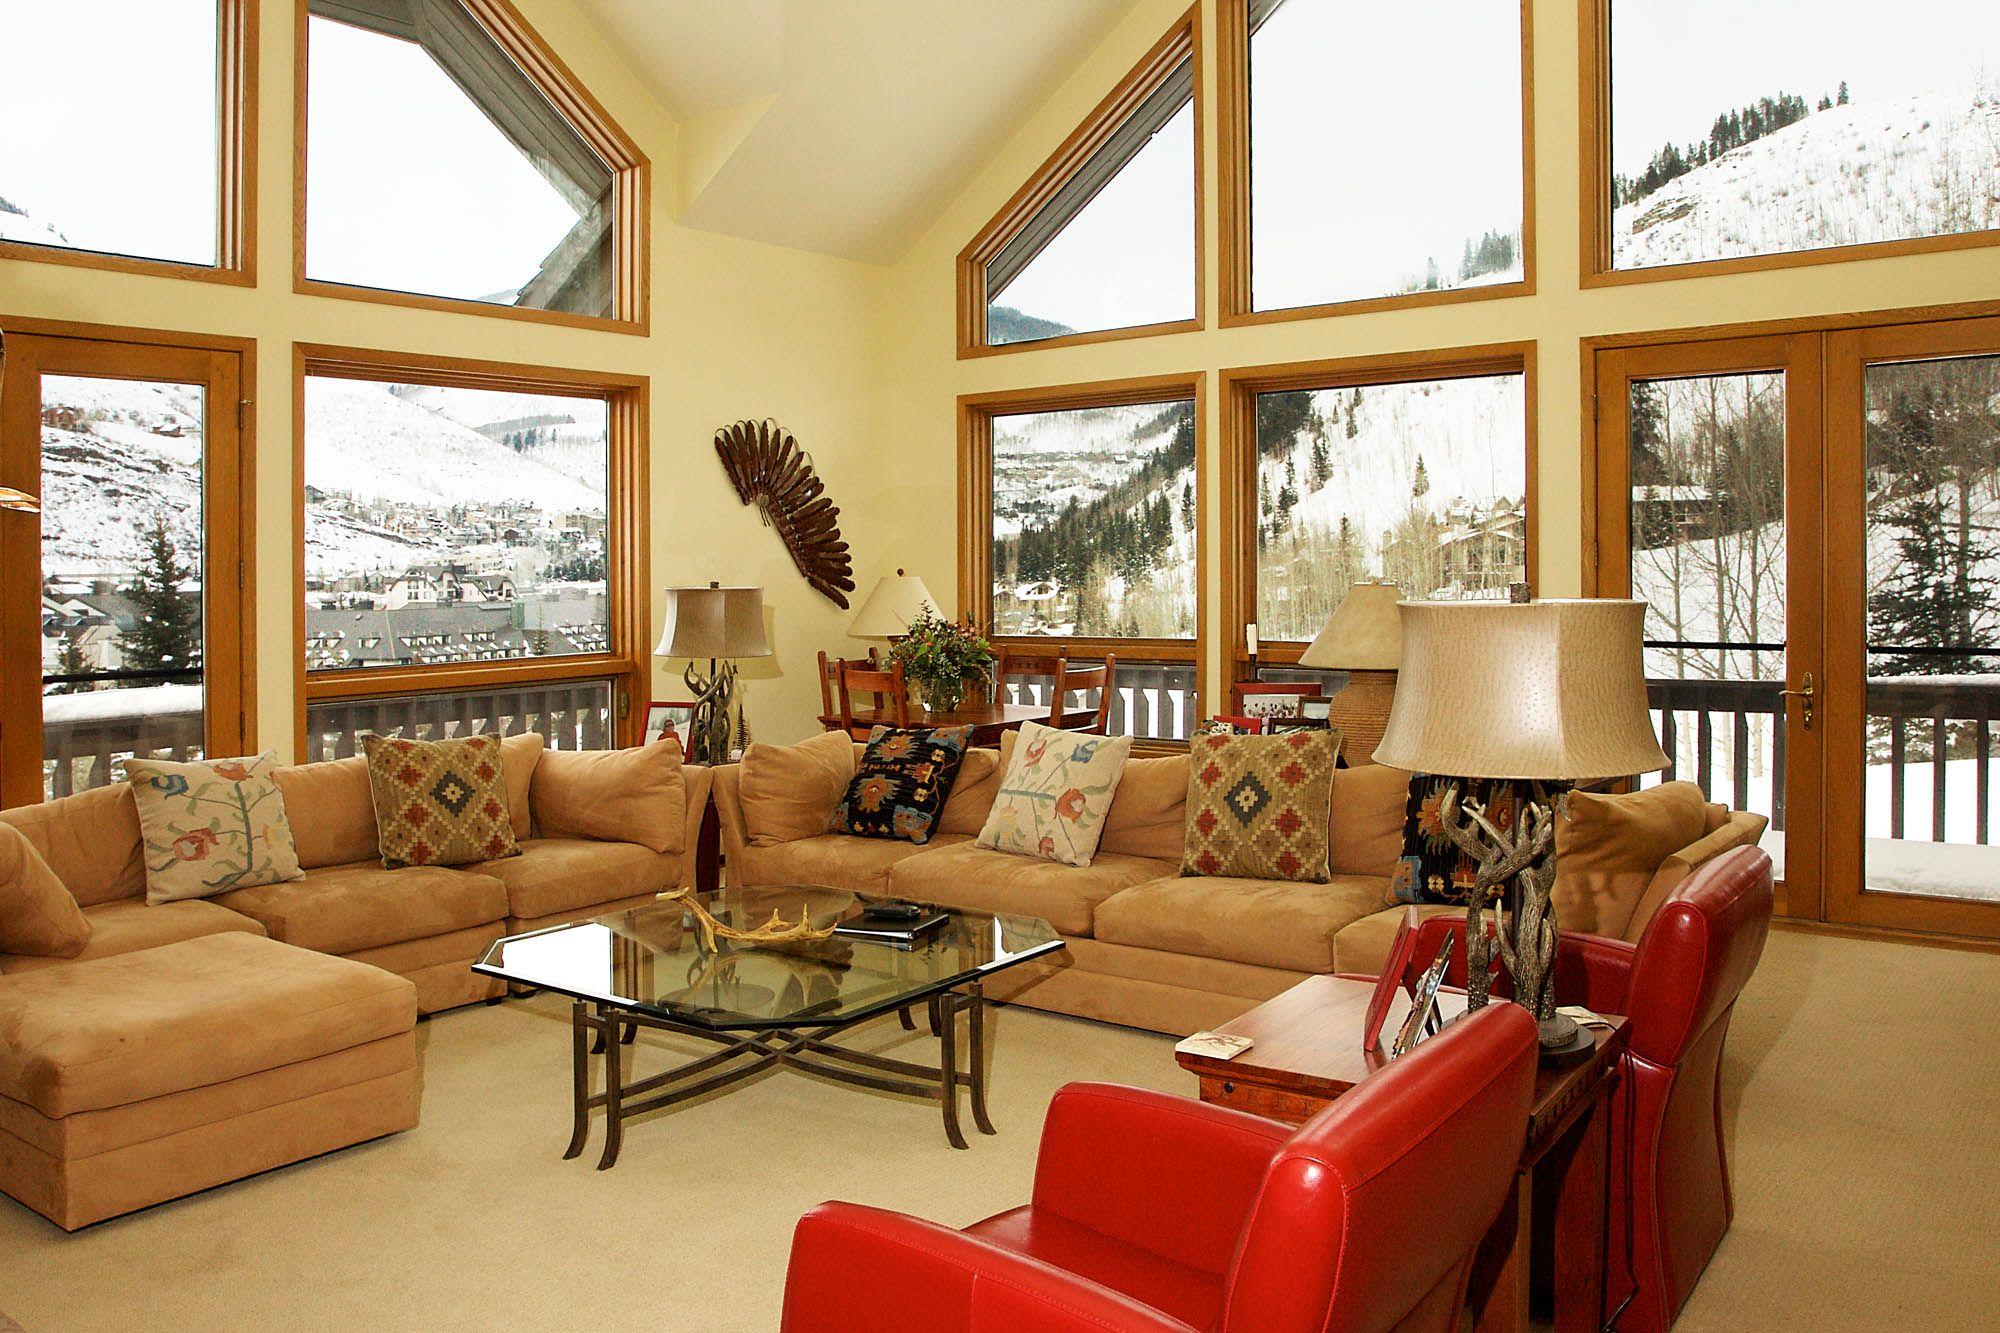 vail resorts, hotels and lodging | vail cascade resort & spa